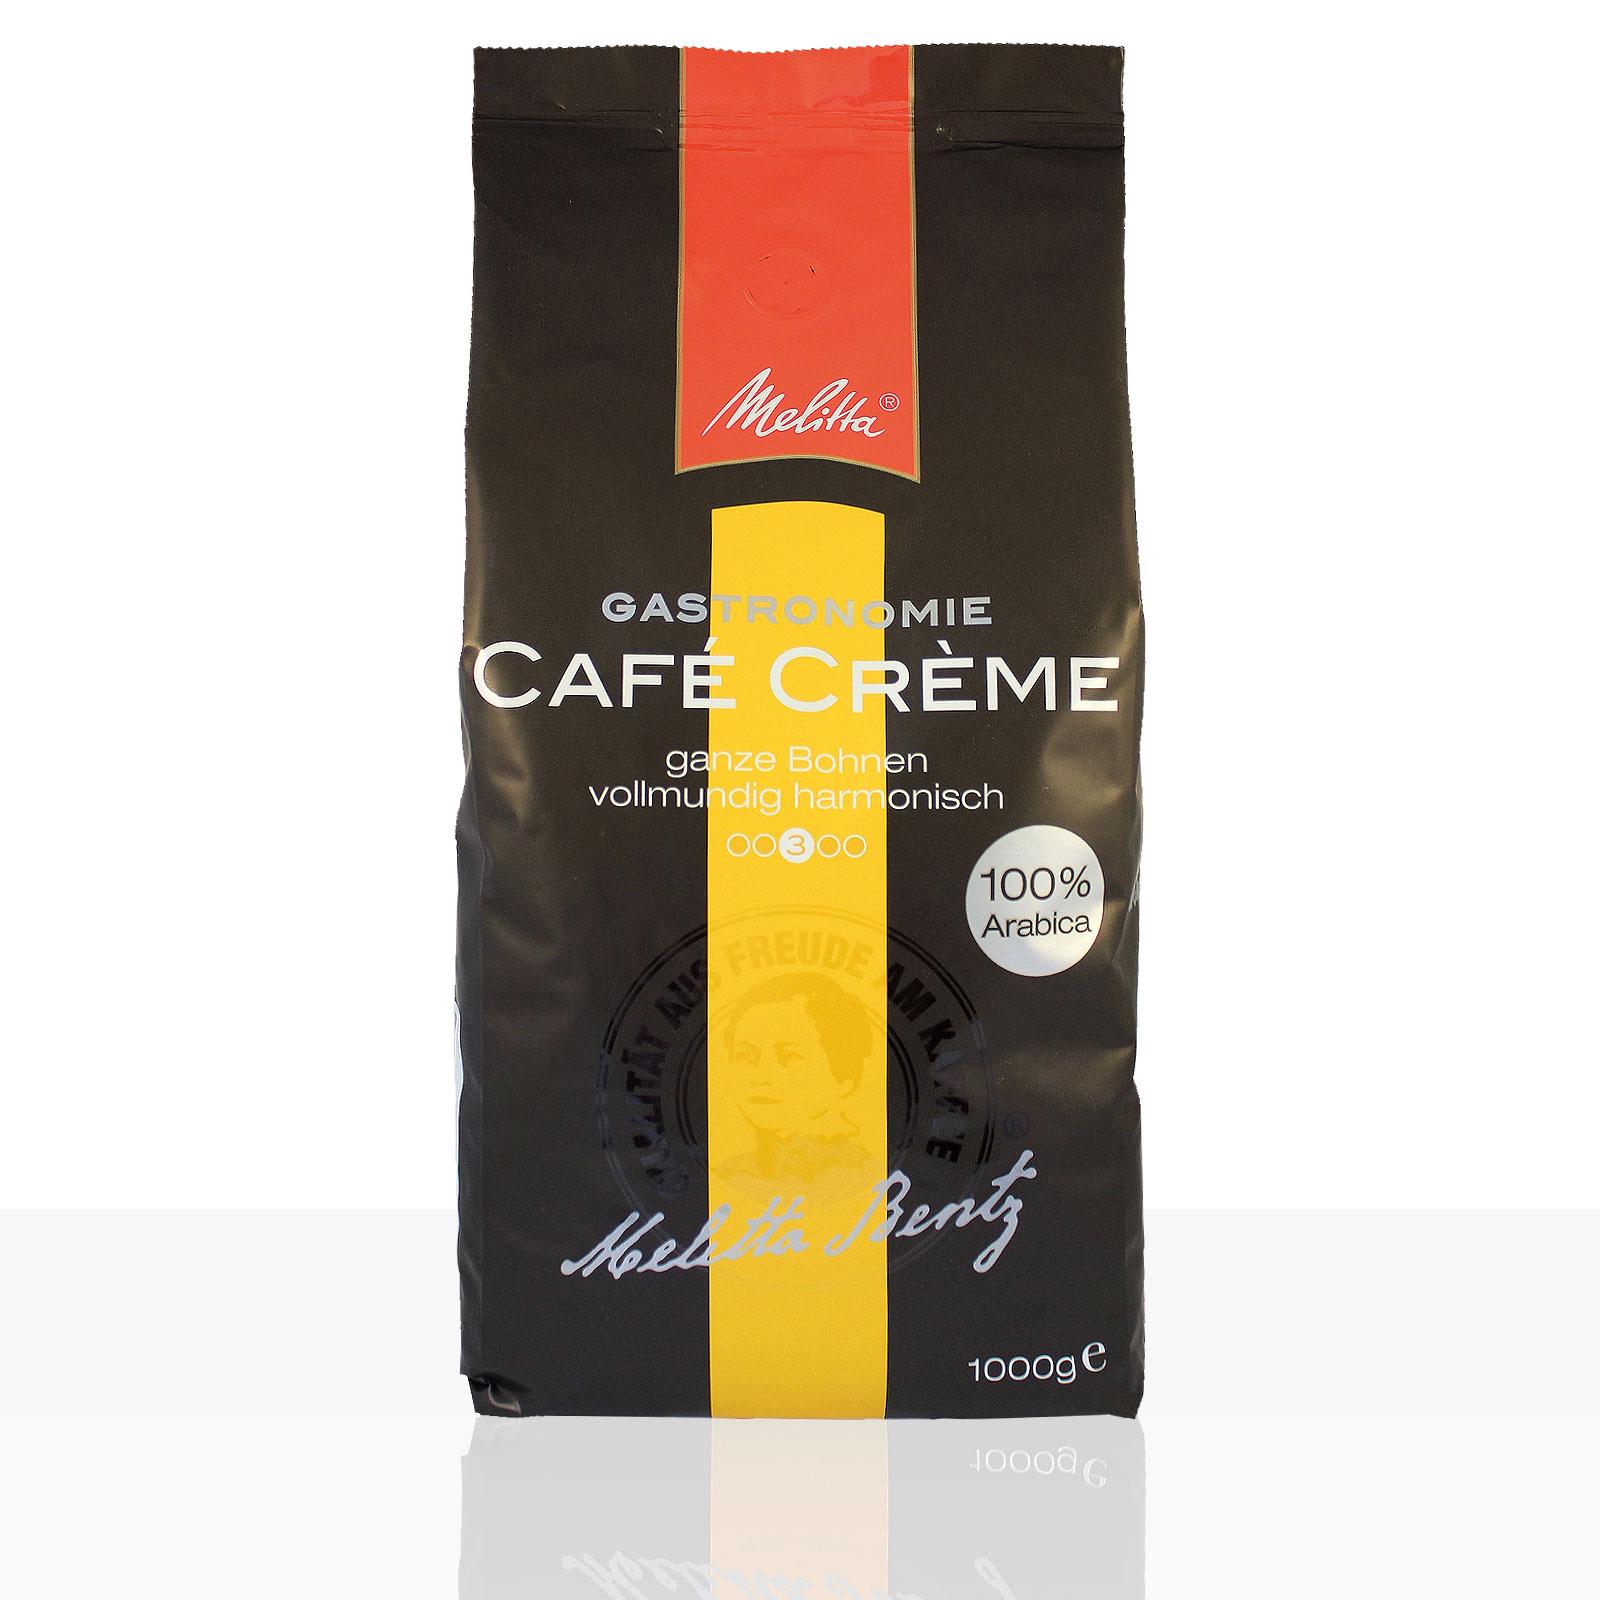 Melitta Gastronomie Café Crème 100% Arabica - 1kg Kaffee ganze Bohne